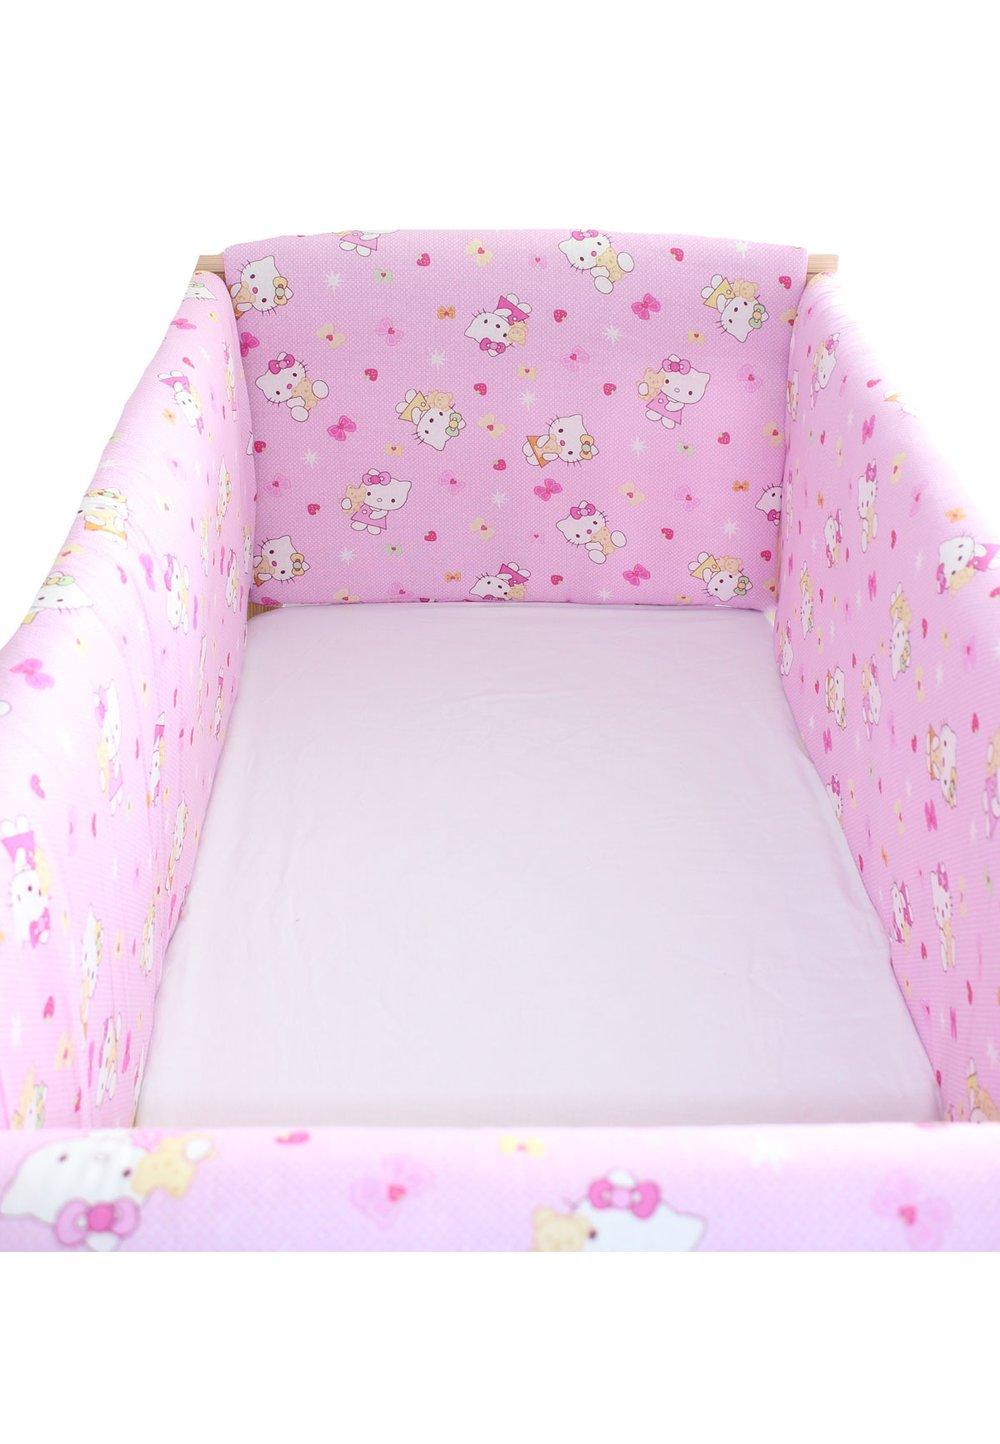 Set aparatori patut, Maxi, Hello Kitty, roz deschis, 120x60cm imagine